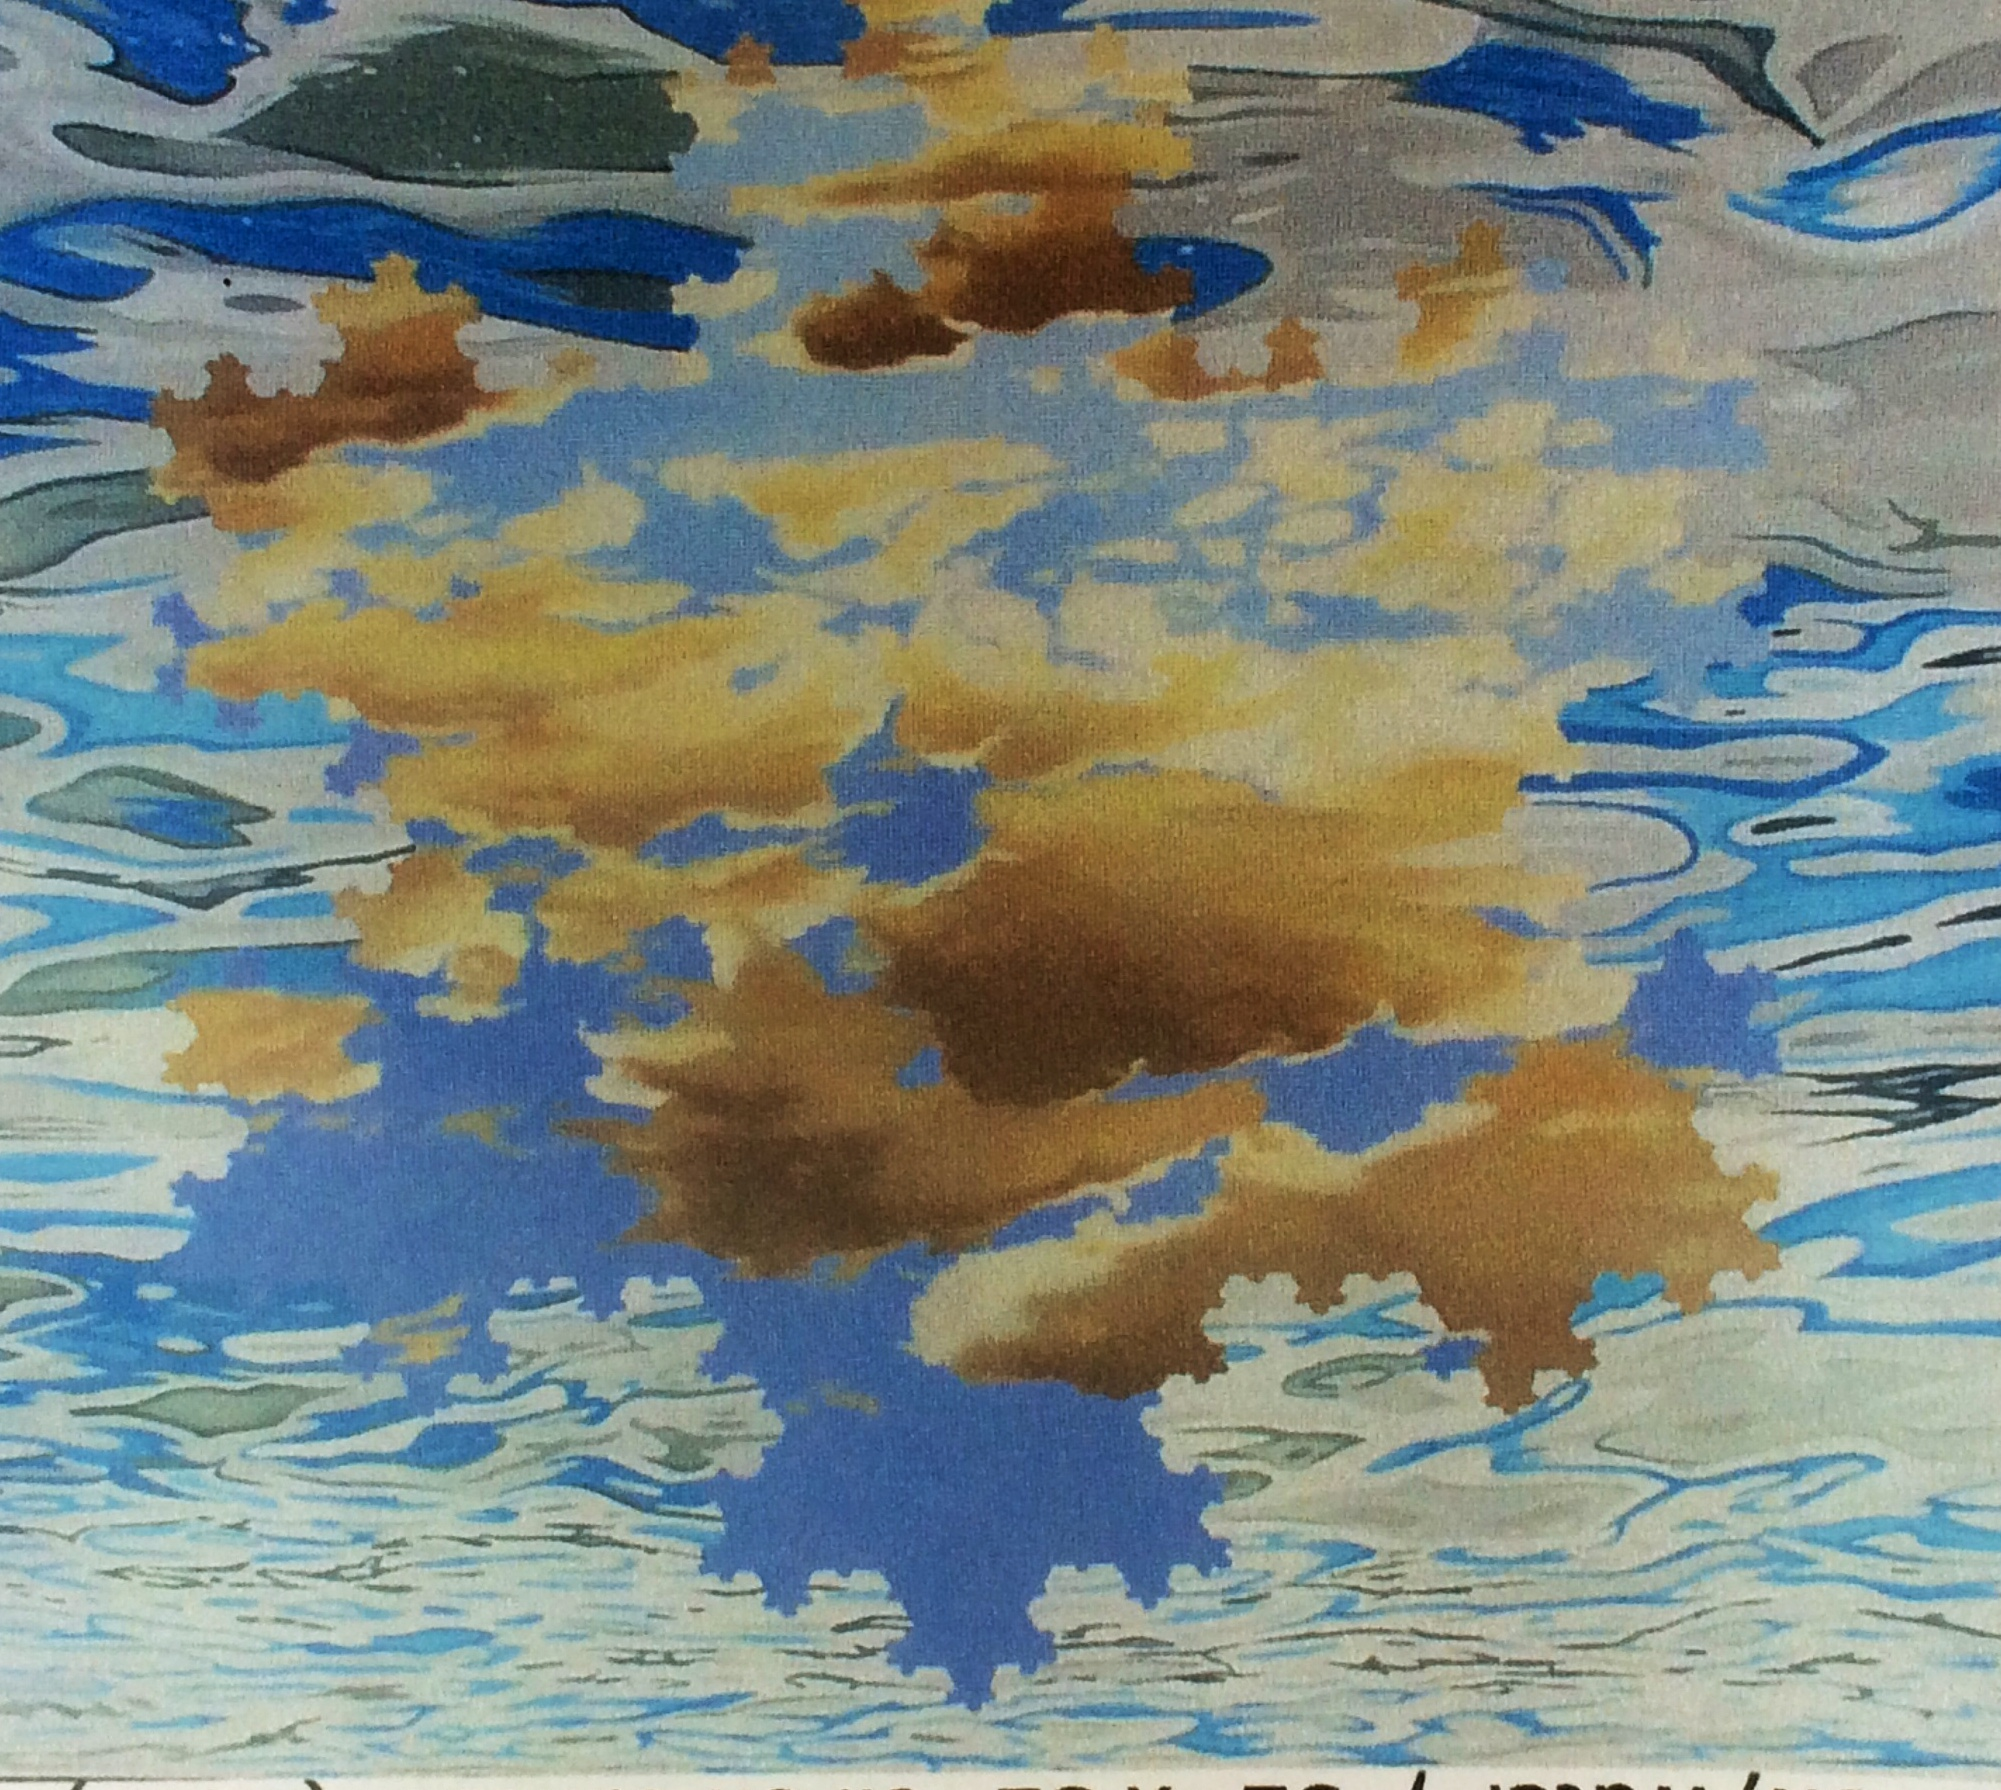 """Clouds"" by John Gurbacs"